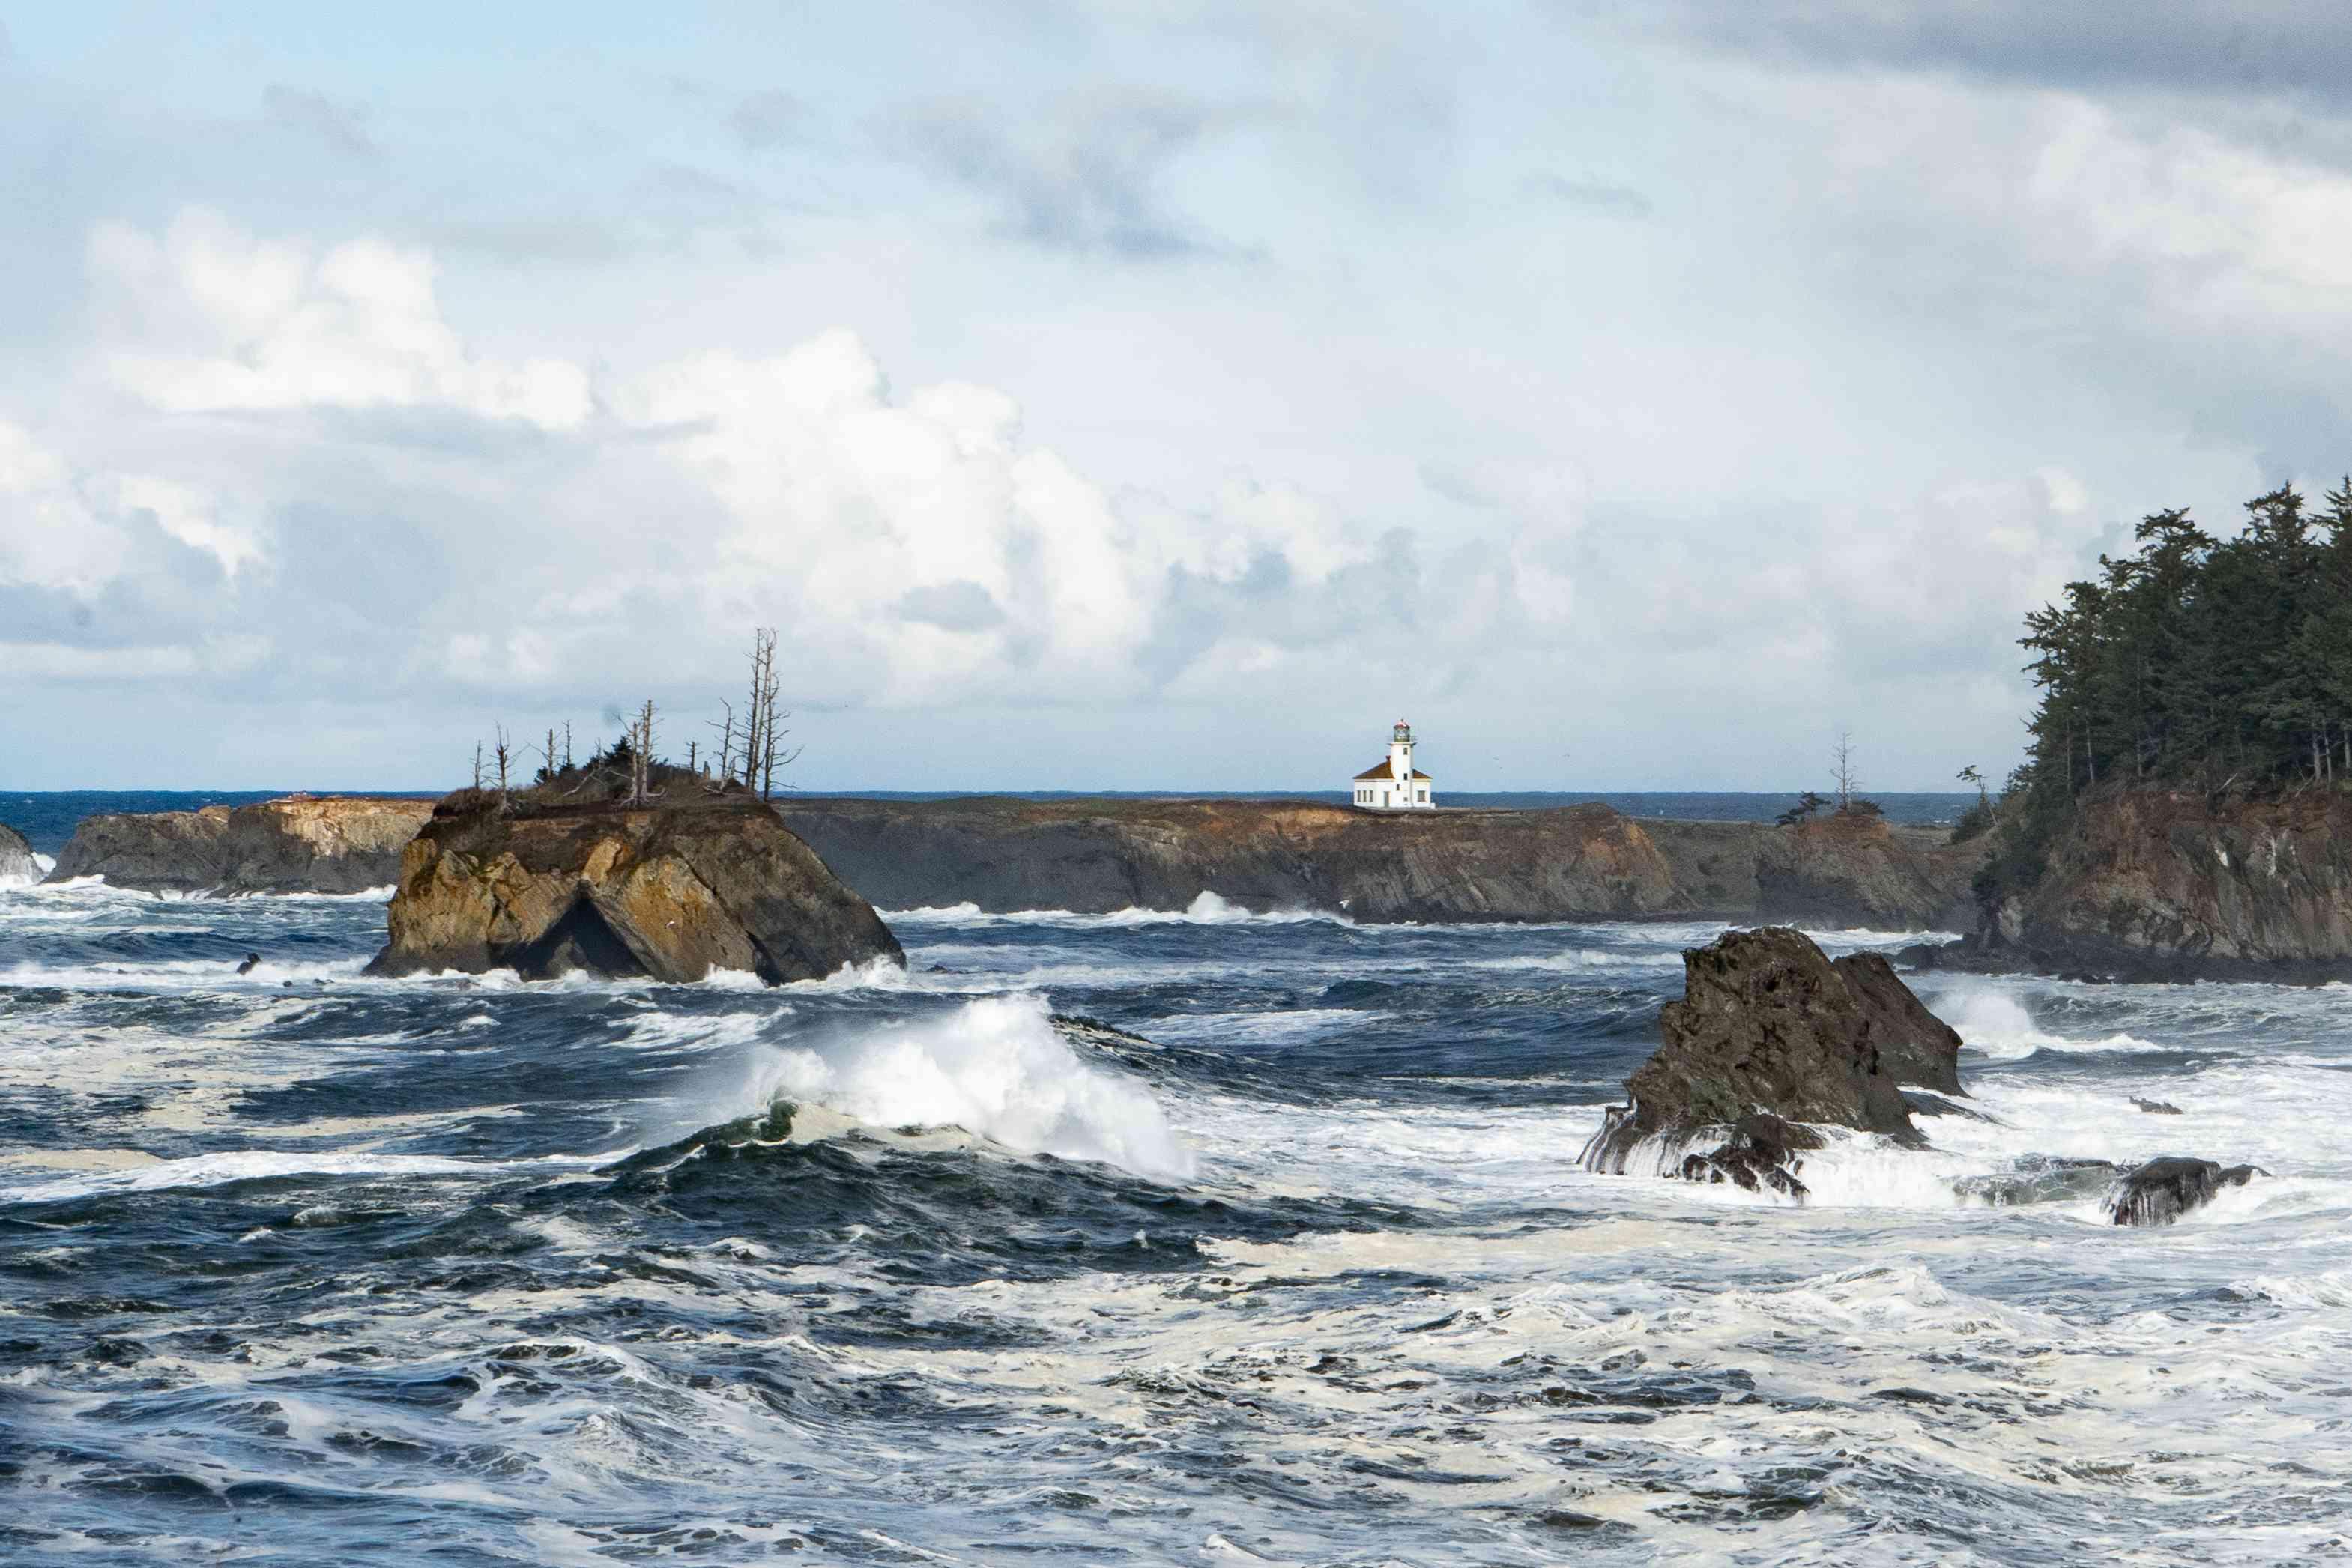 Cape Arago Lighthouse on the coast